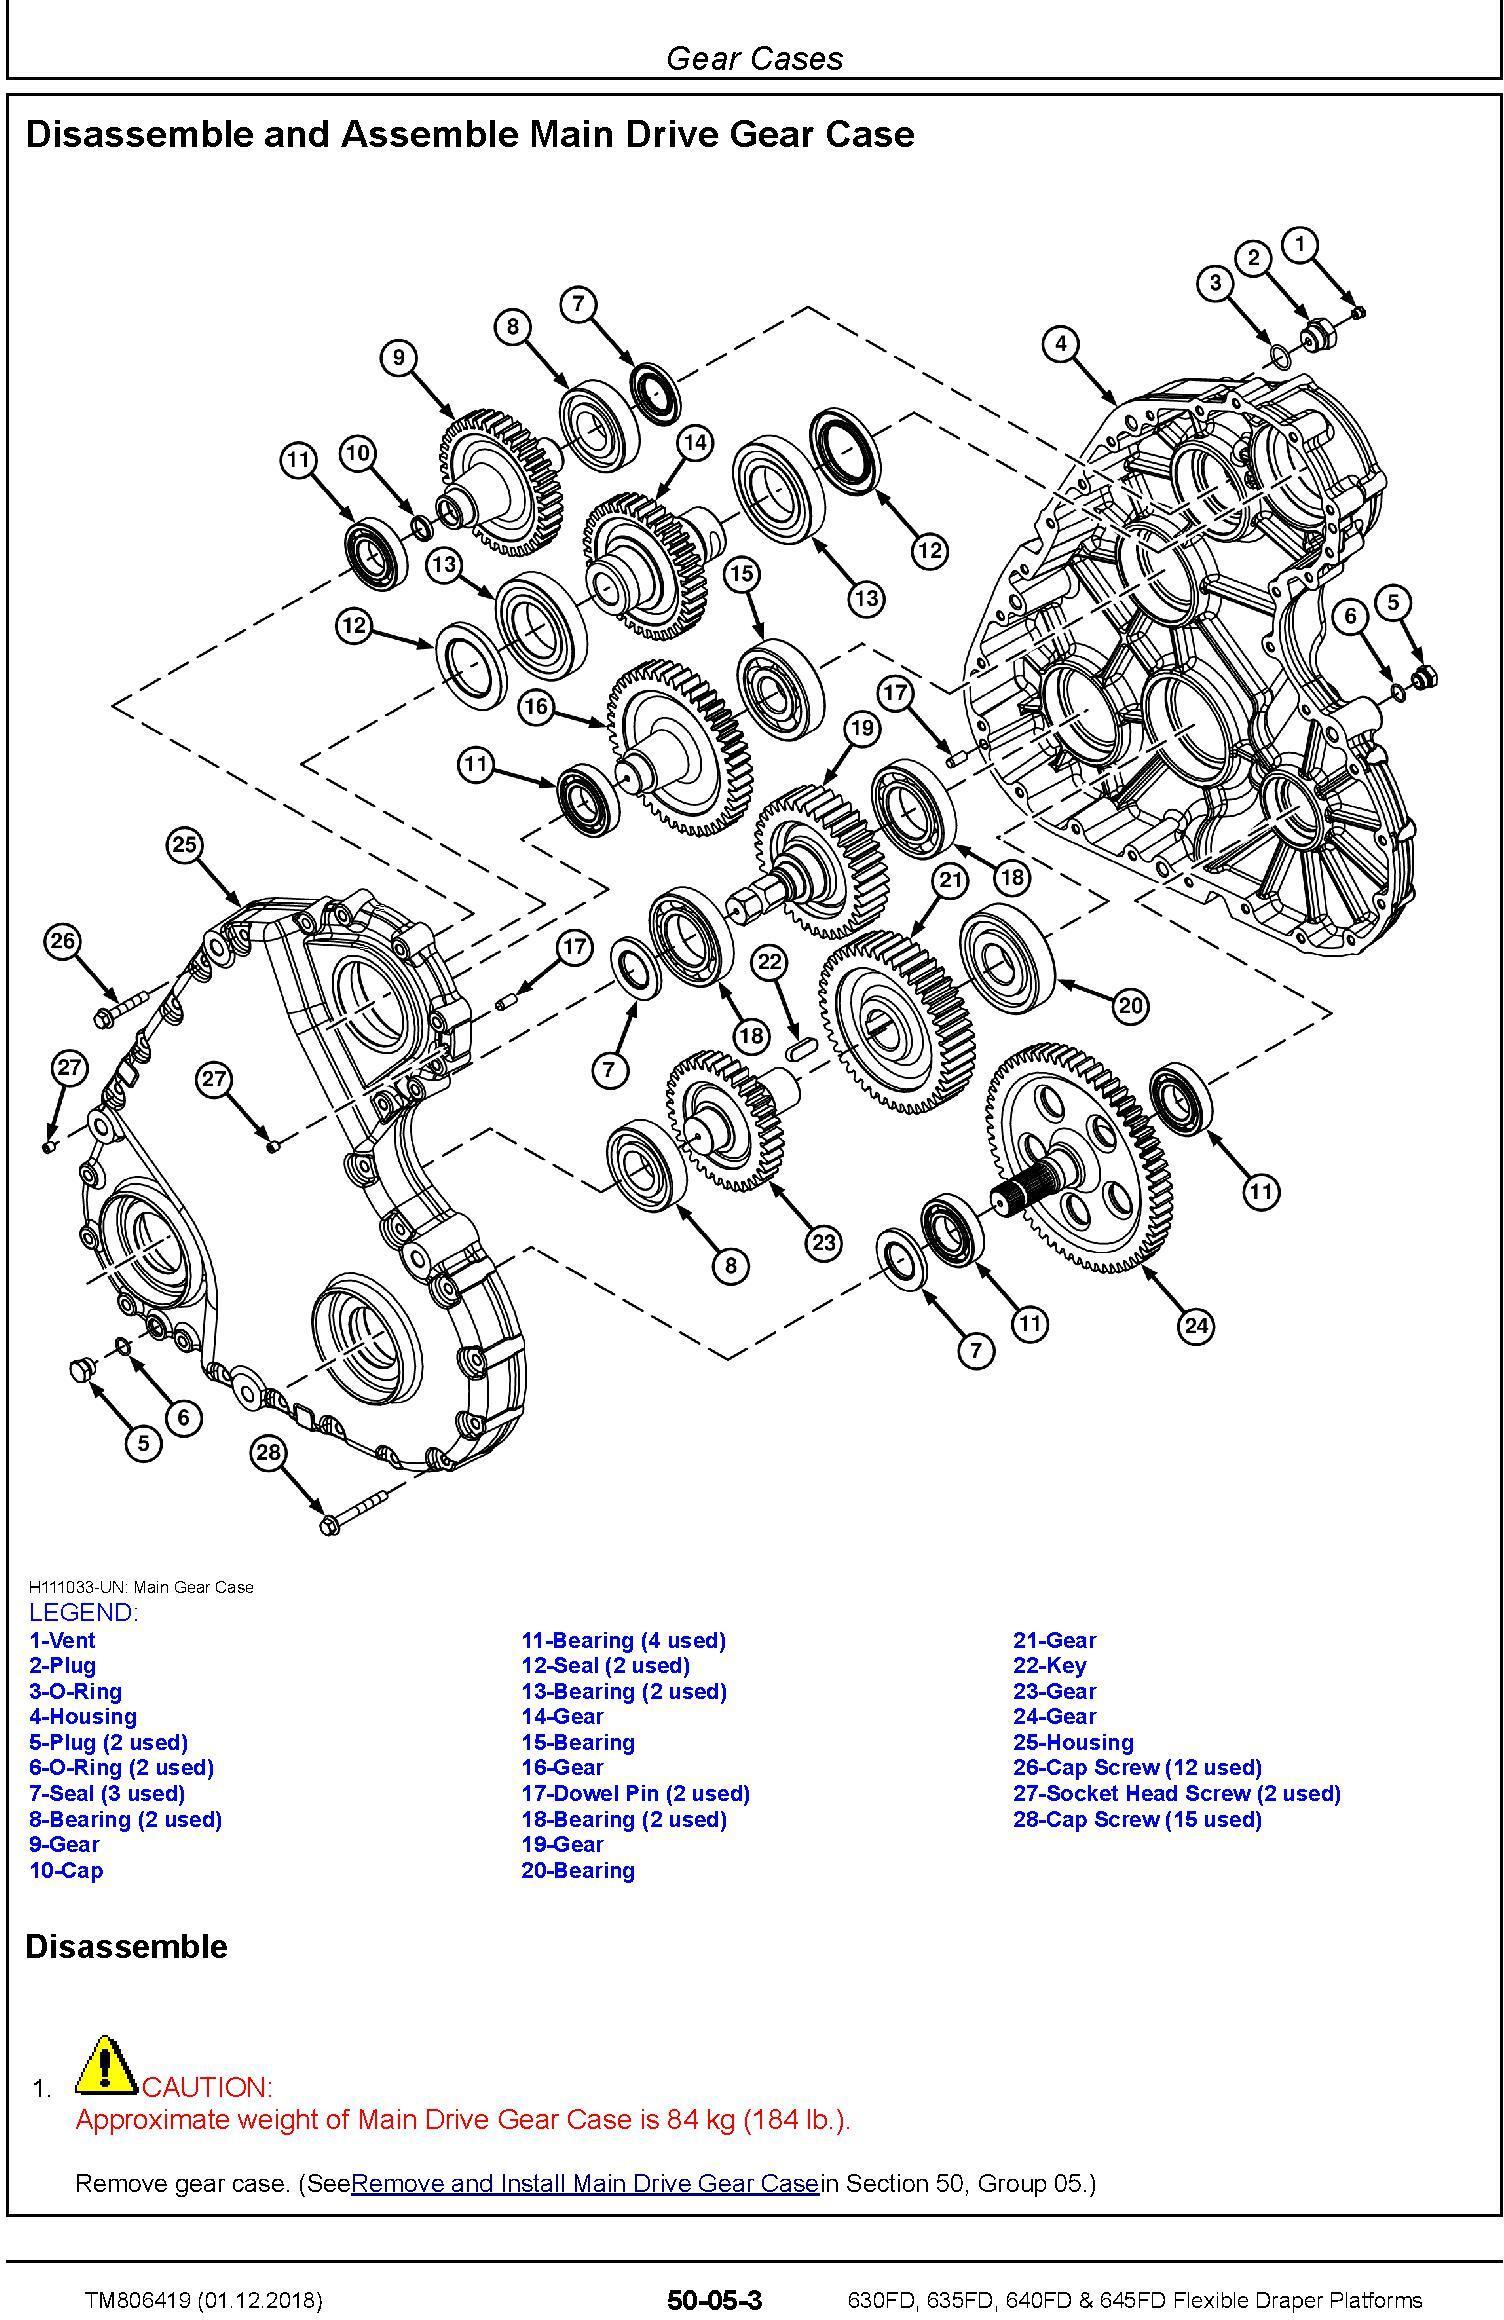 John Deere 630FD, 635FD, 640FD, 645FD Flexible Draper Platform (SN.120100-) Repair Manual (TM806419) - 1